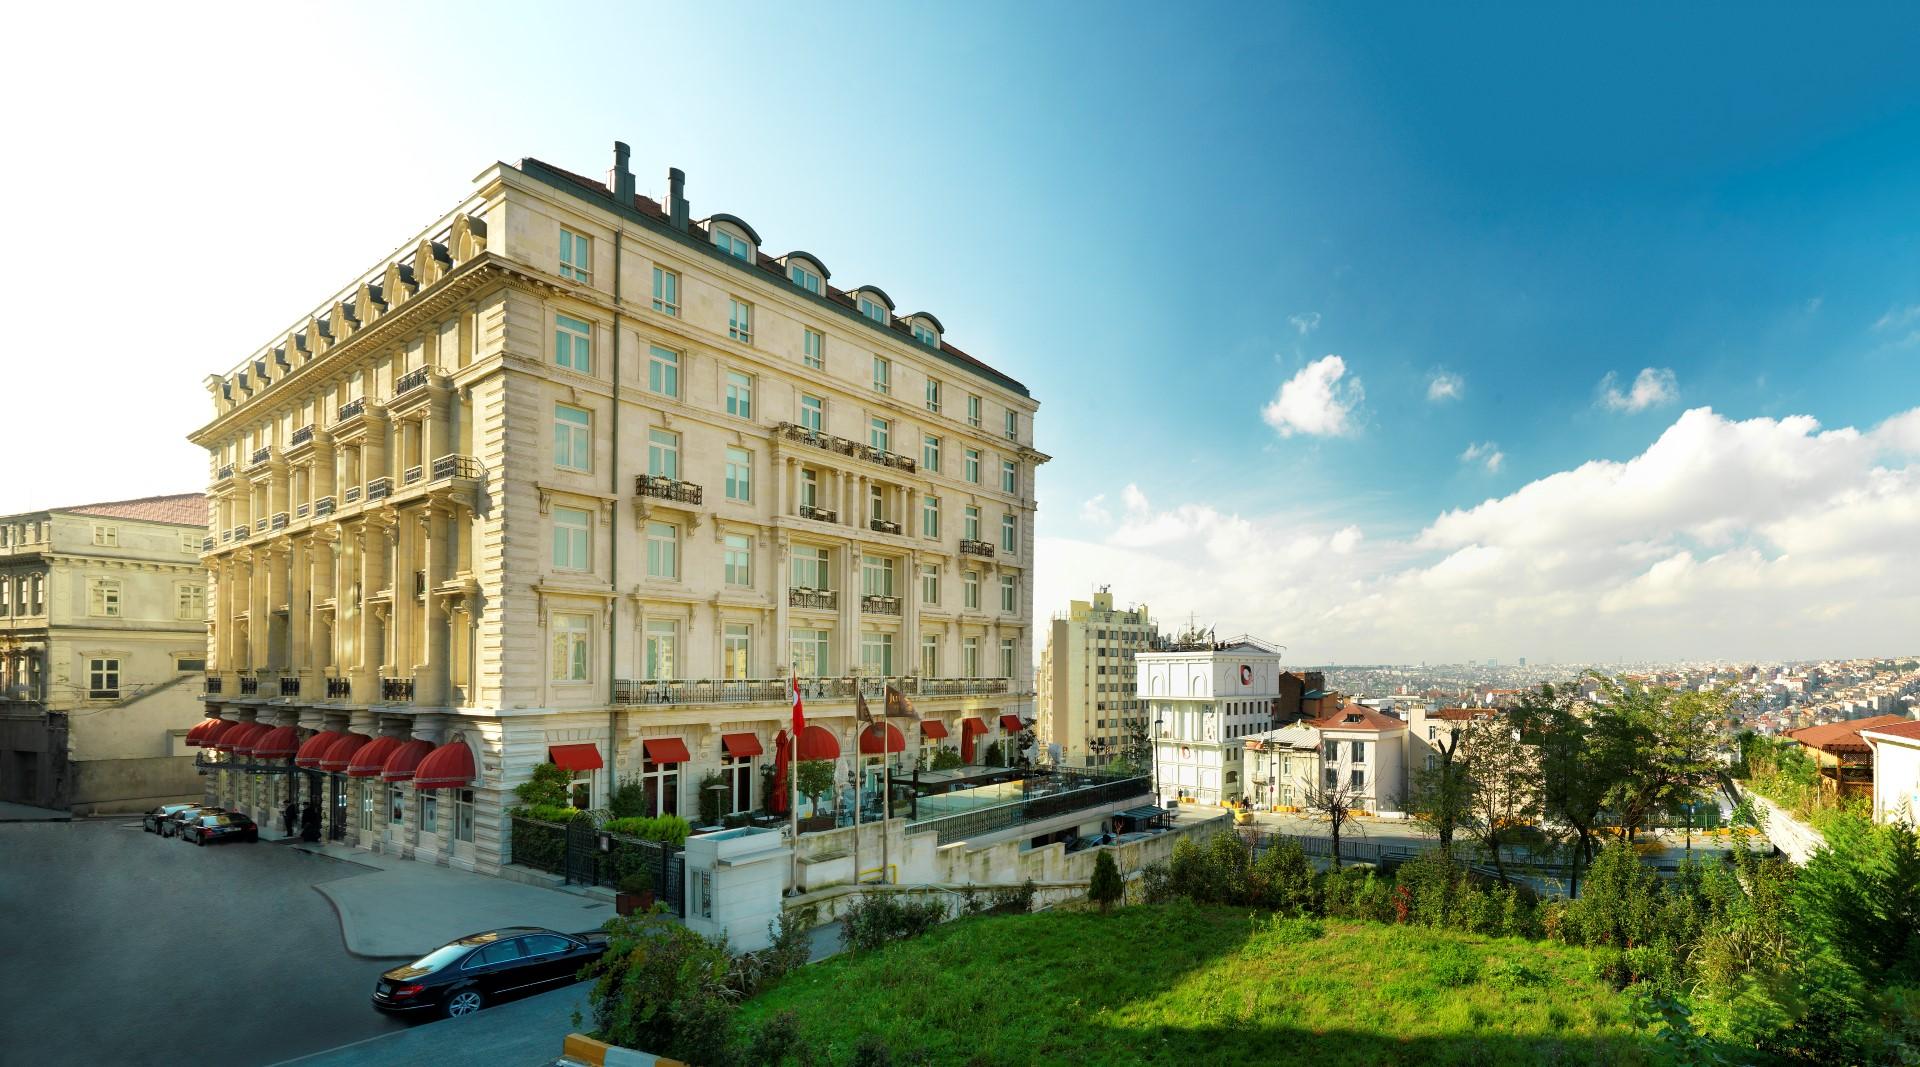 Das legendäre Pera Palace Hotel